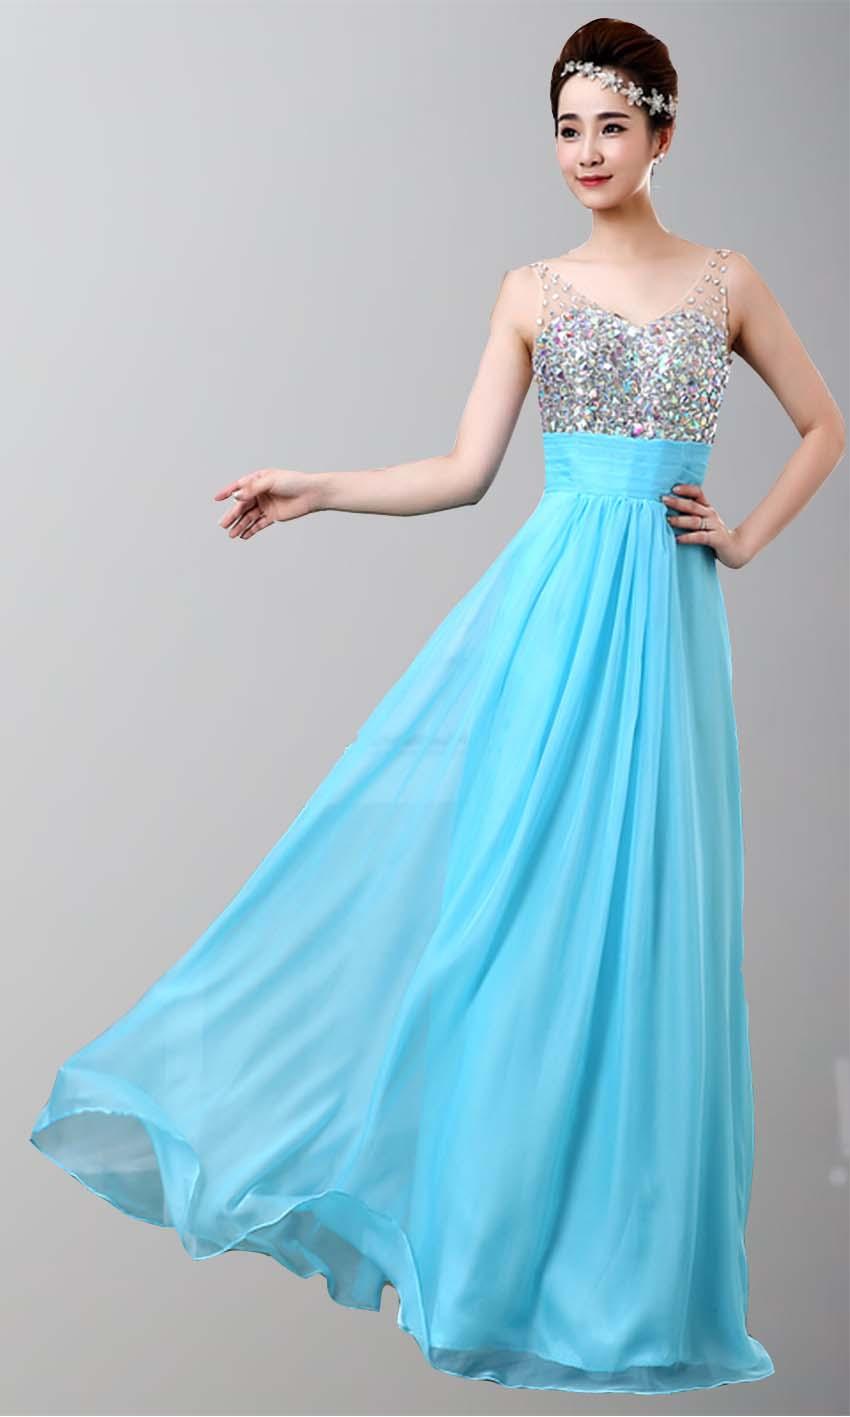 Teal Rhinestone empire Long Lace Prom Dresses 2015 KSP340 [KSP340 ...